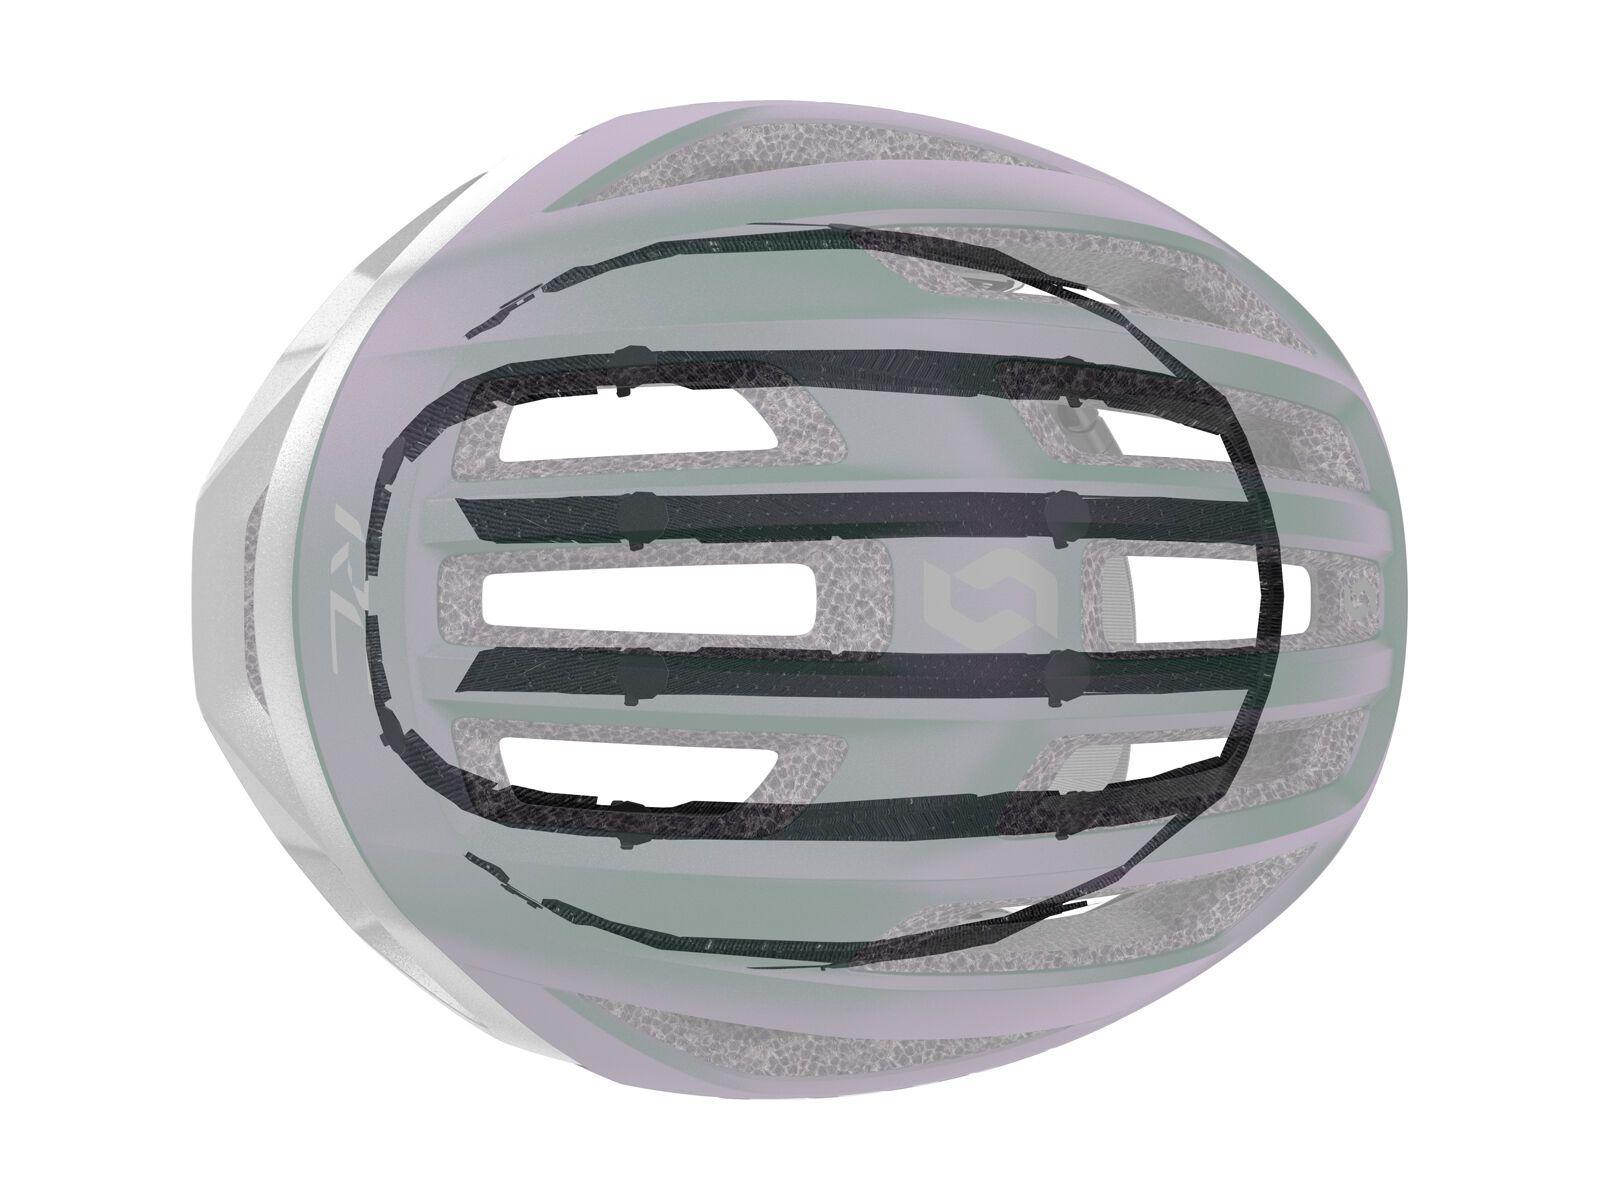 Scott Centric Plus Helmet, vogue silver/reflective | Bild 7